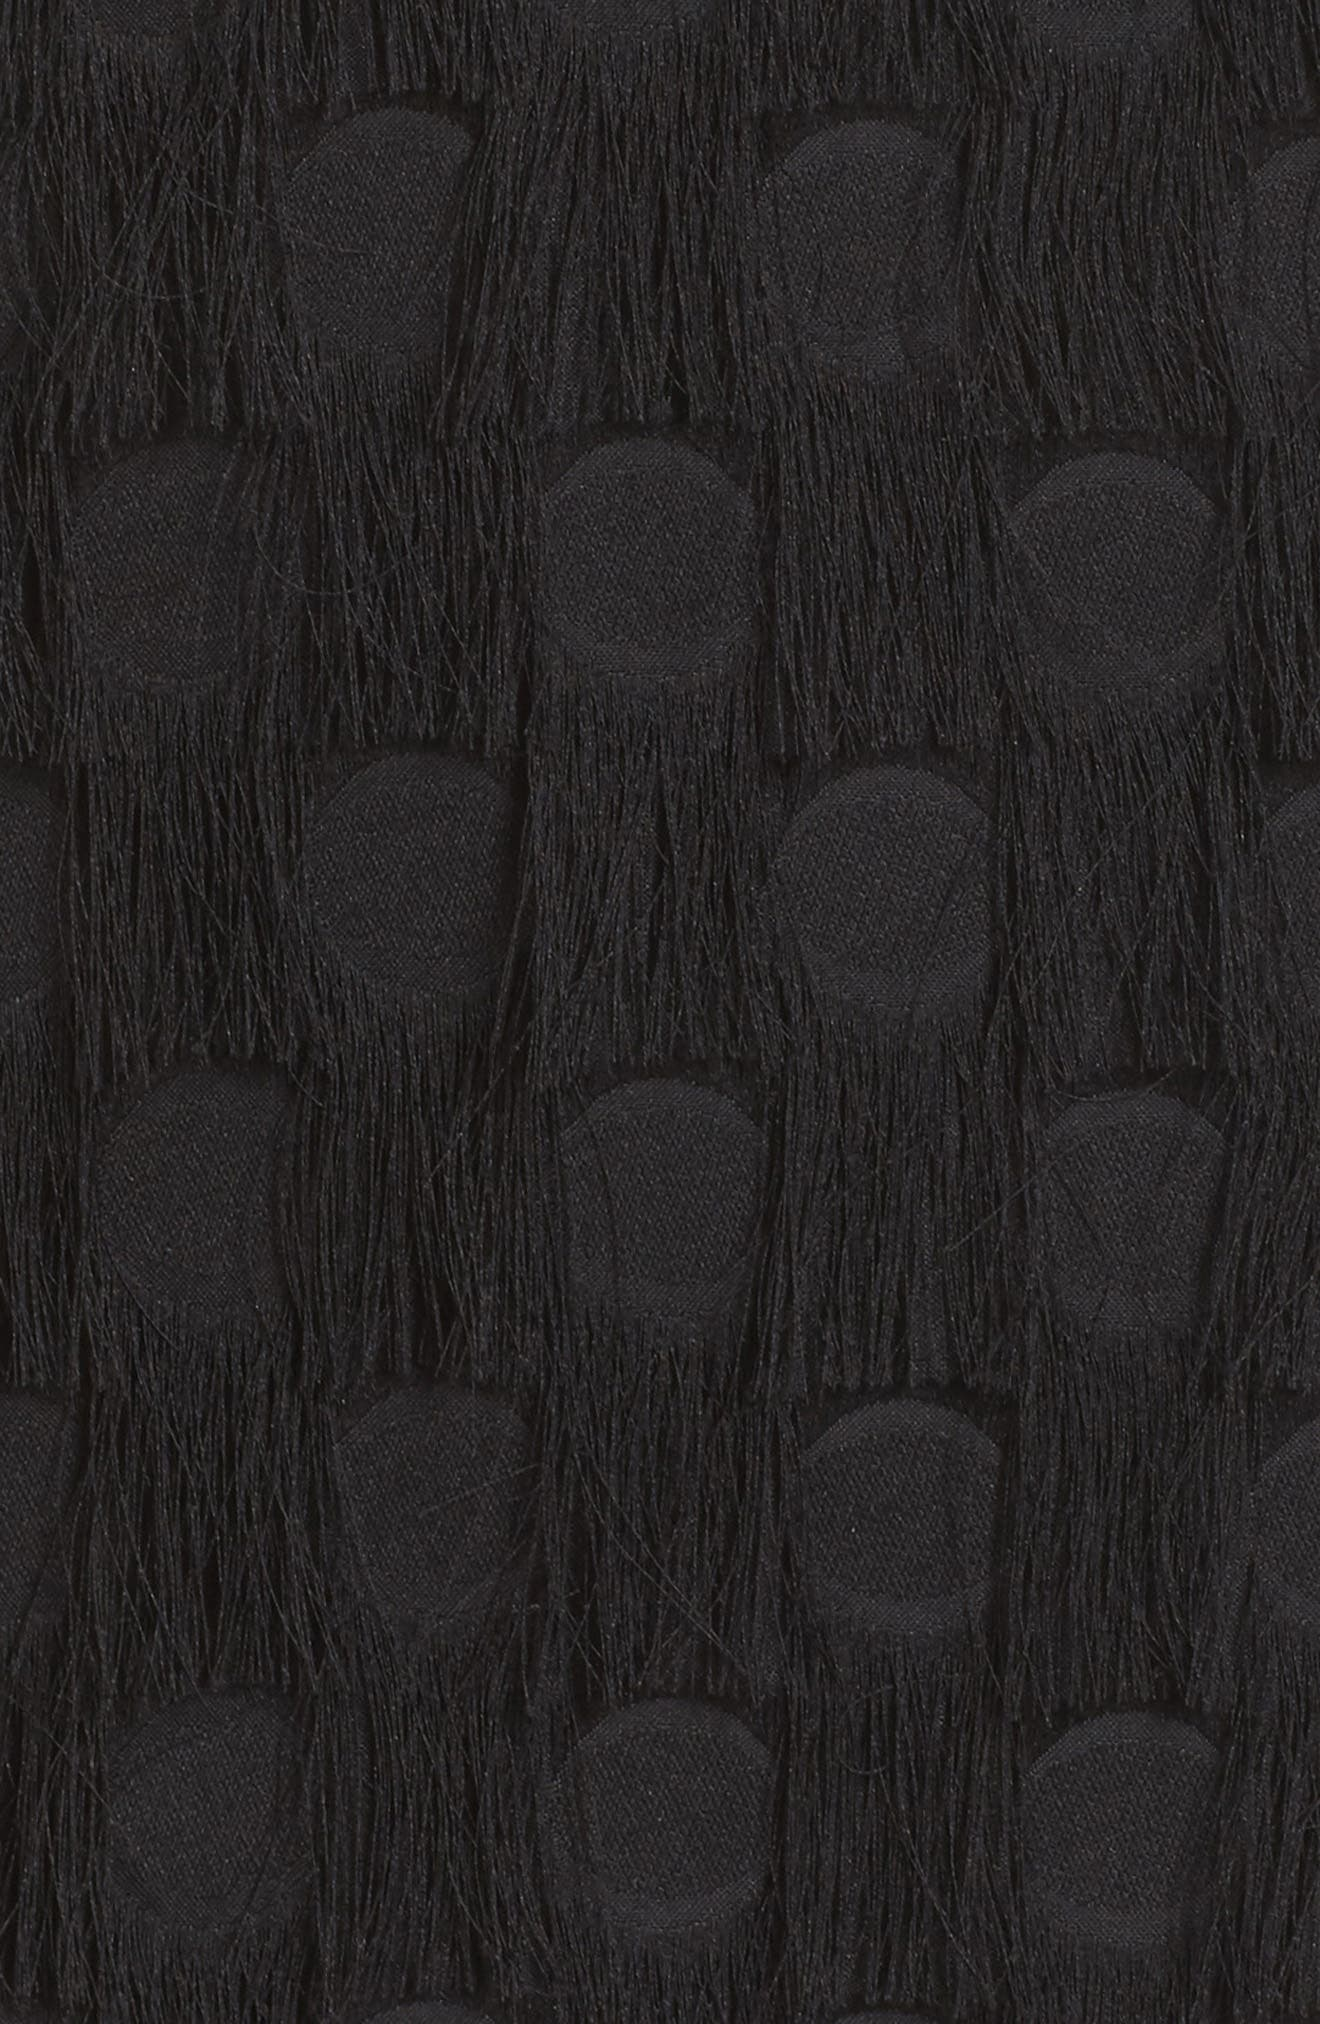 ALI & JAY,                             Shake Your Tail Feathers Minidress,                             Alternate thumbnail 5, color,                             001